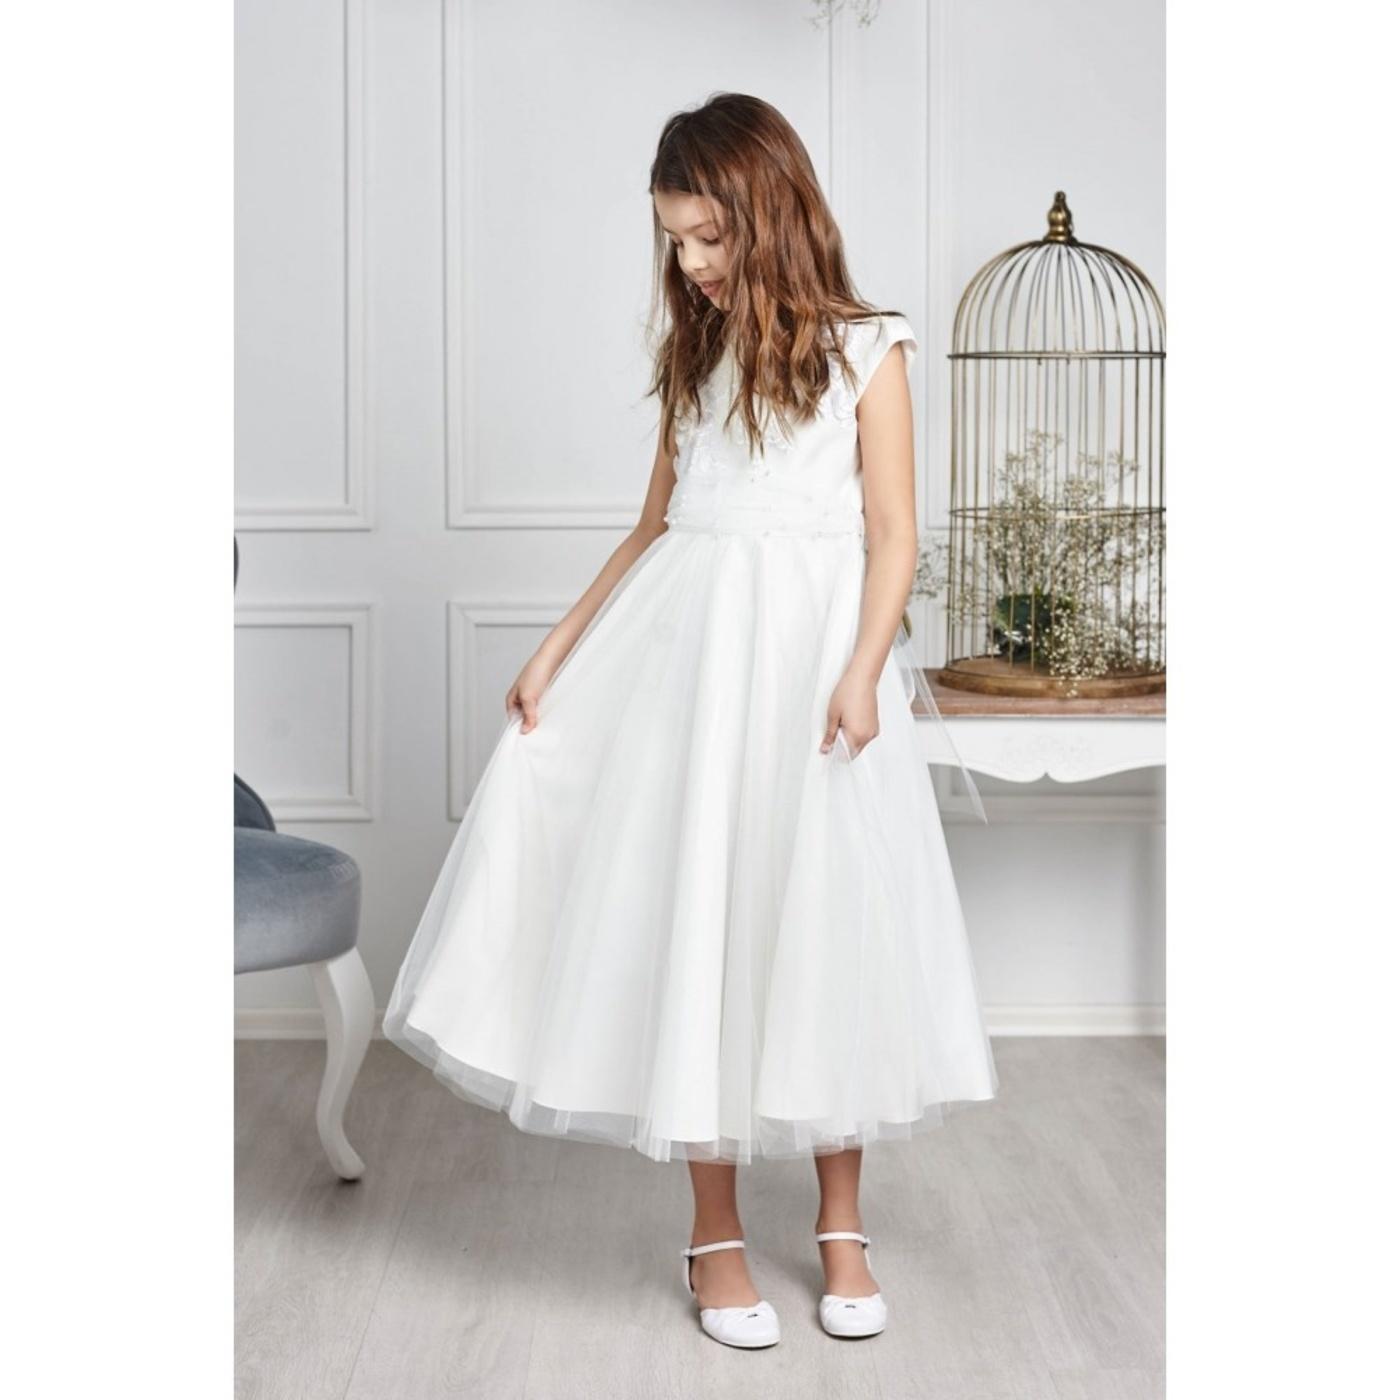 371987bff4 ... Sukienka komunijna tiulowa Eliza Ecru